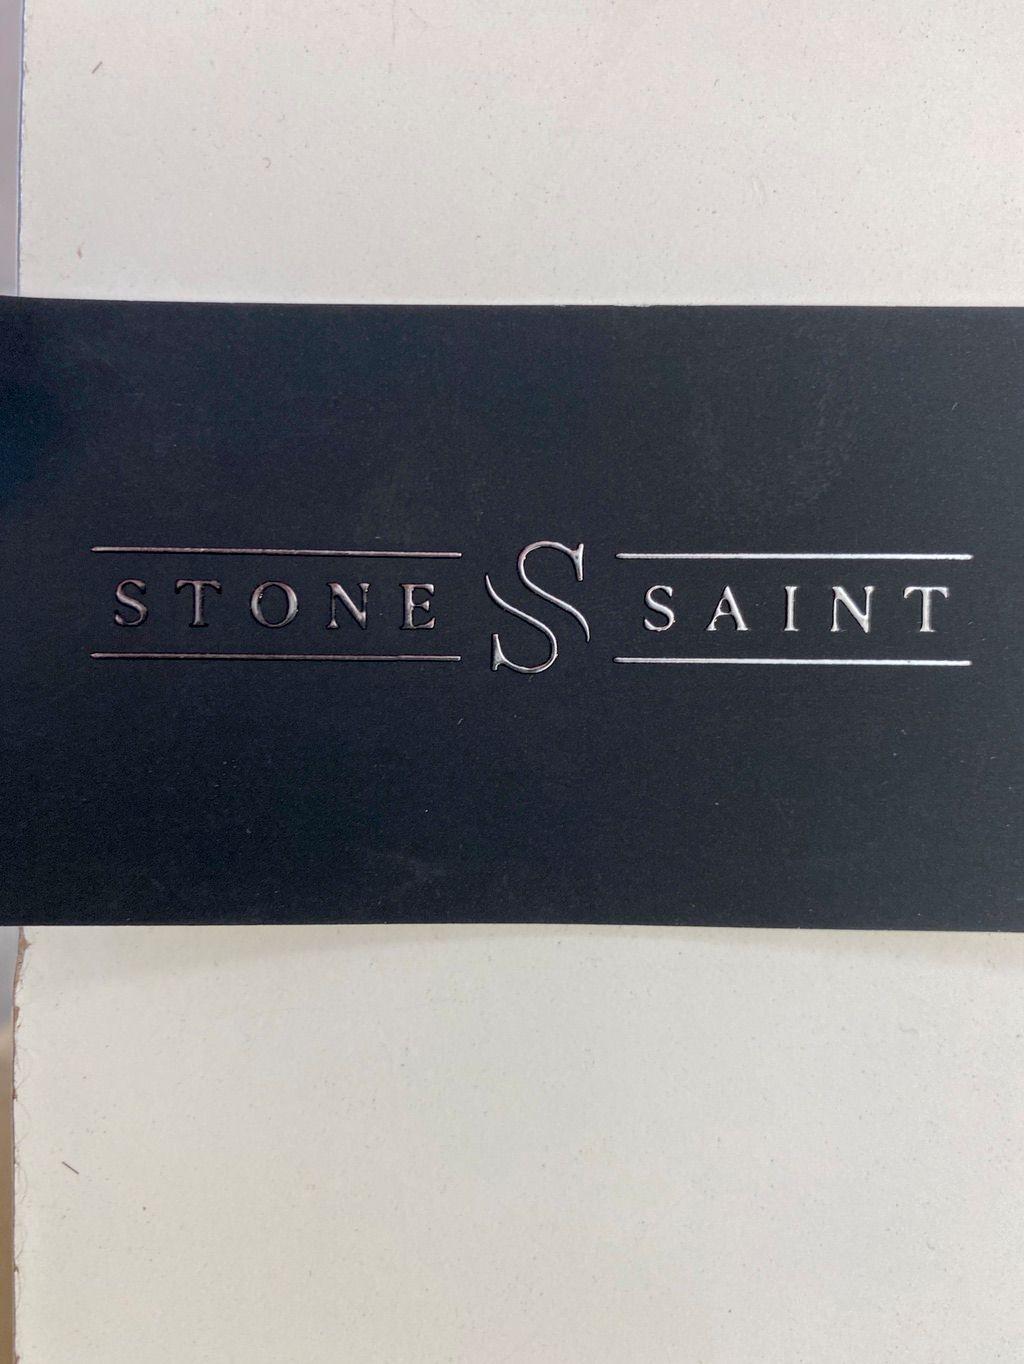 Stone Saint LLC